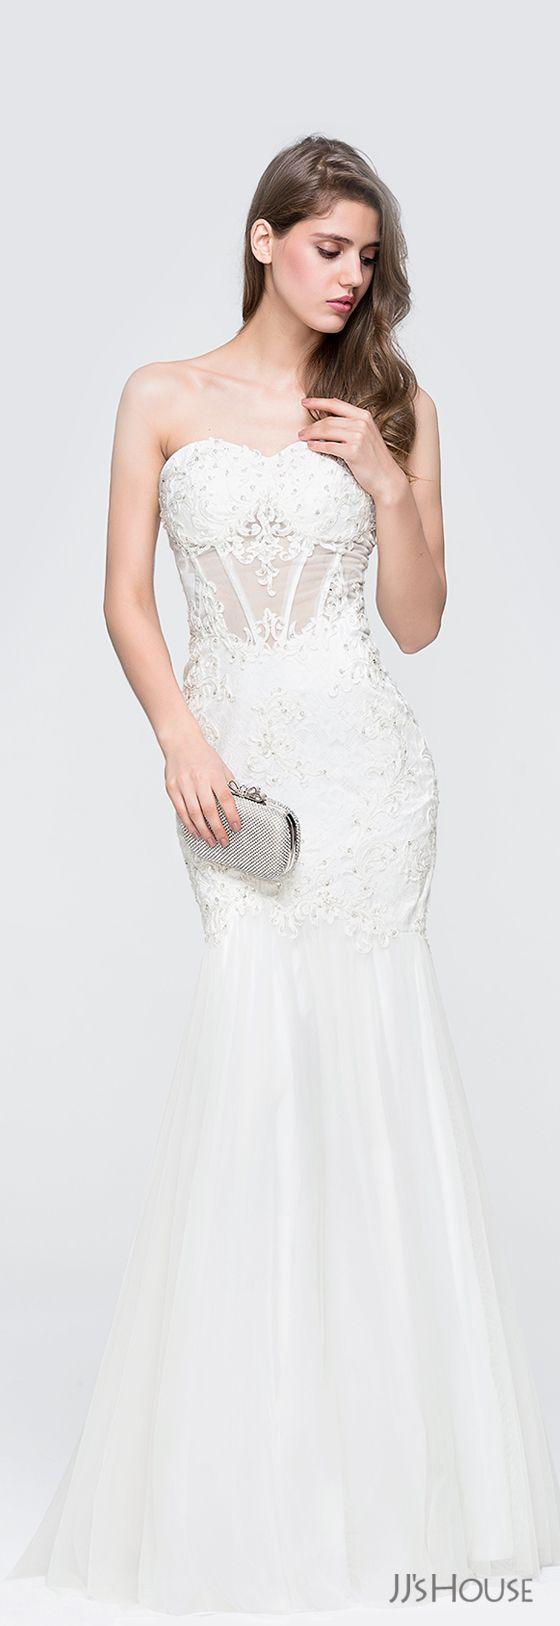 Jjshouse prom wedd pinterest prom mermaid sweetheart and